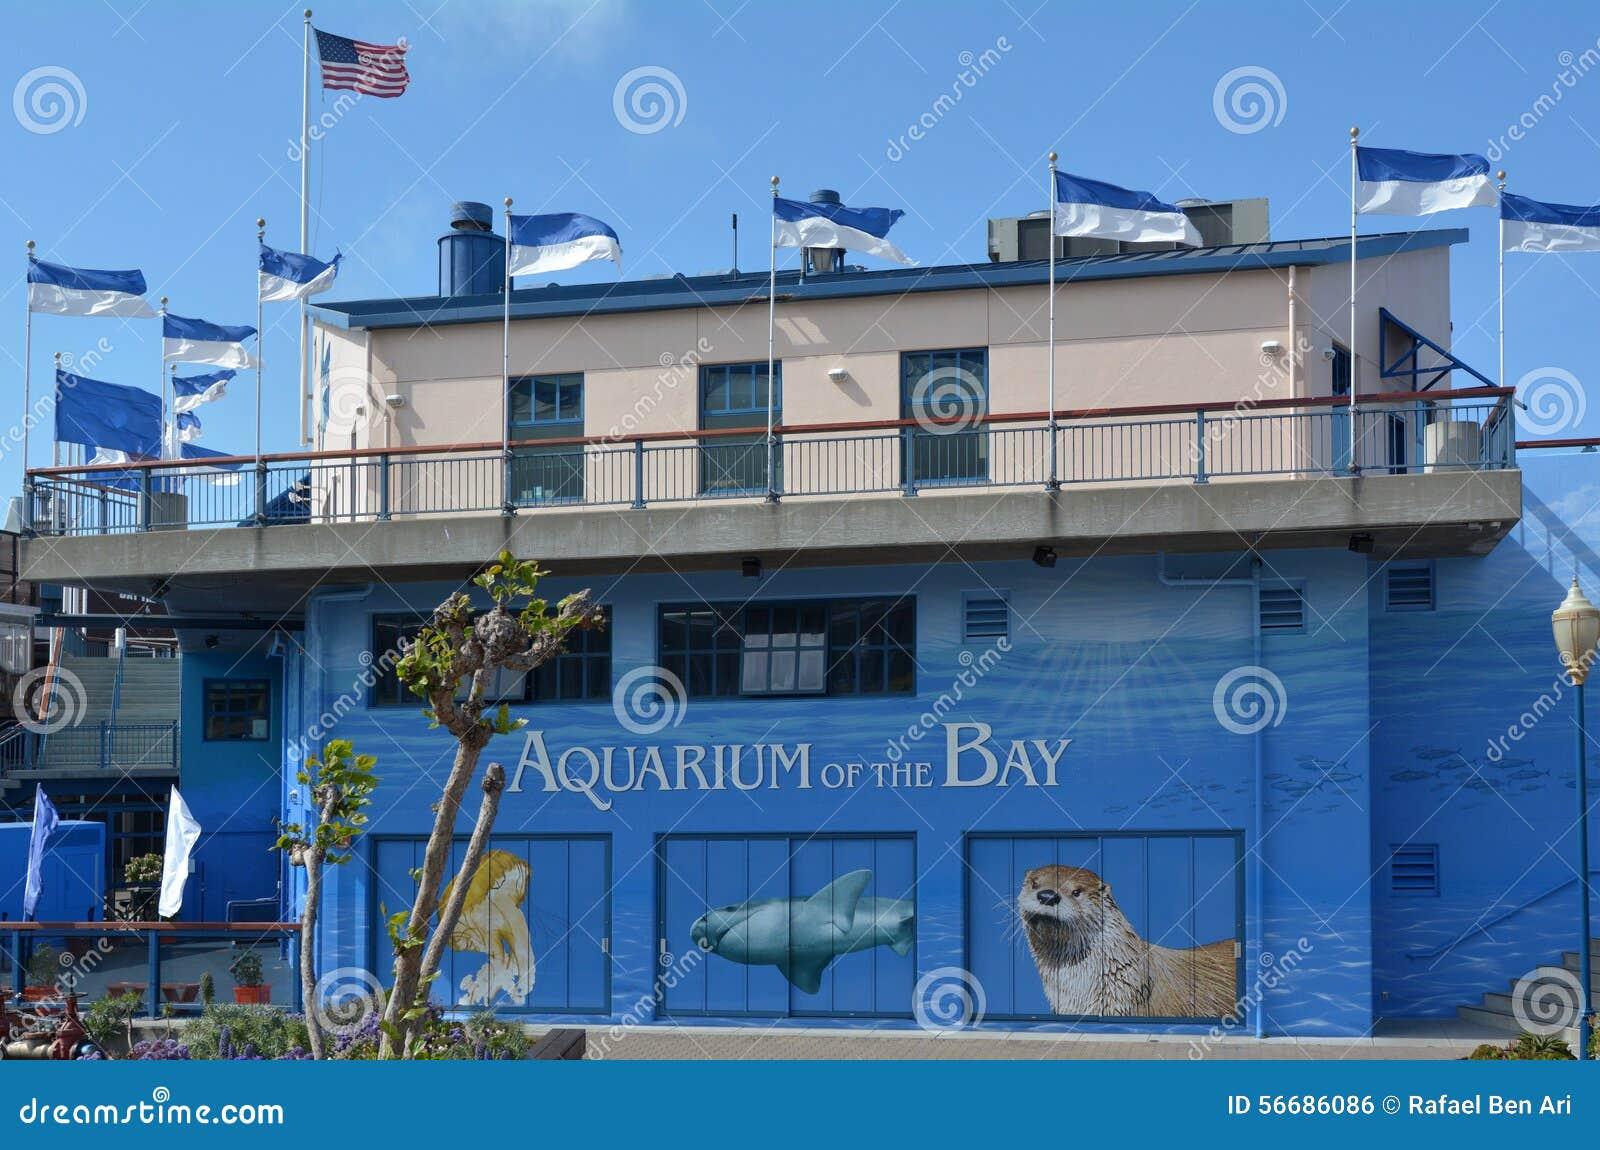 Aquarium Of The Bay In San Francisco California